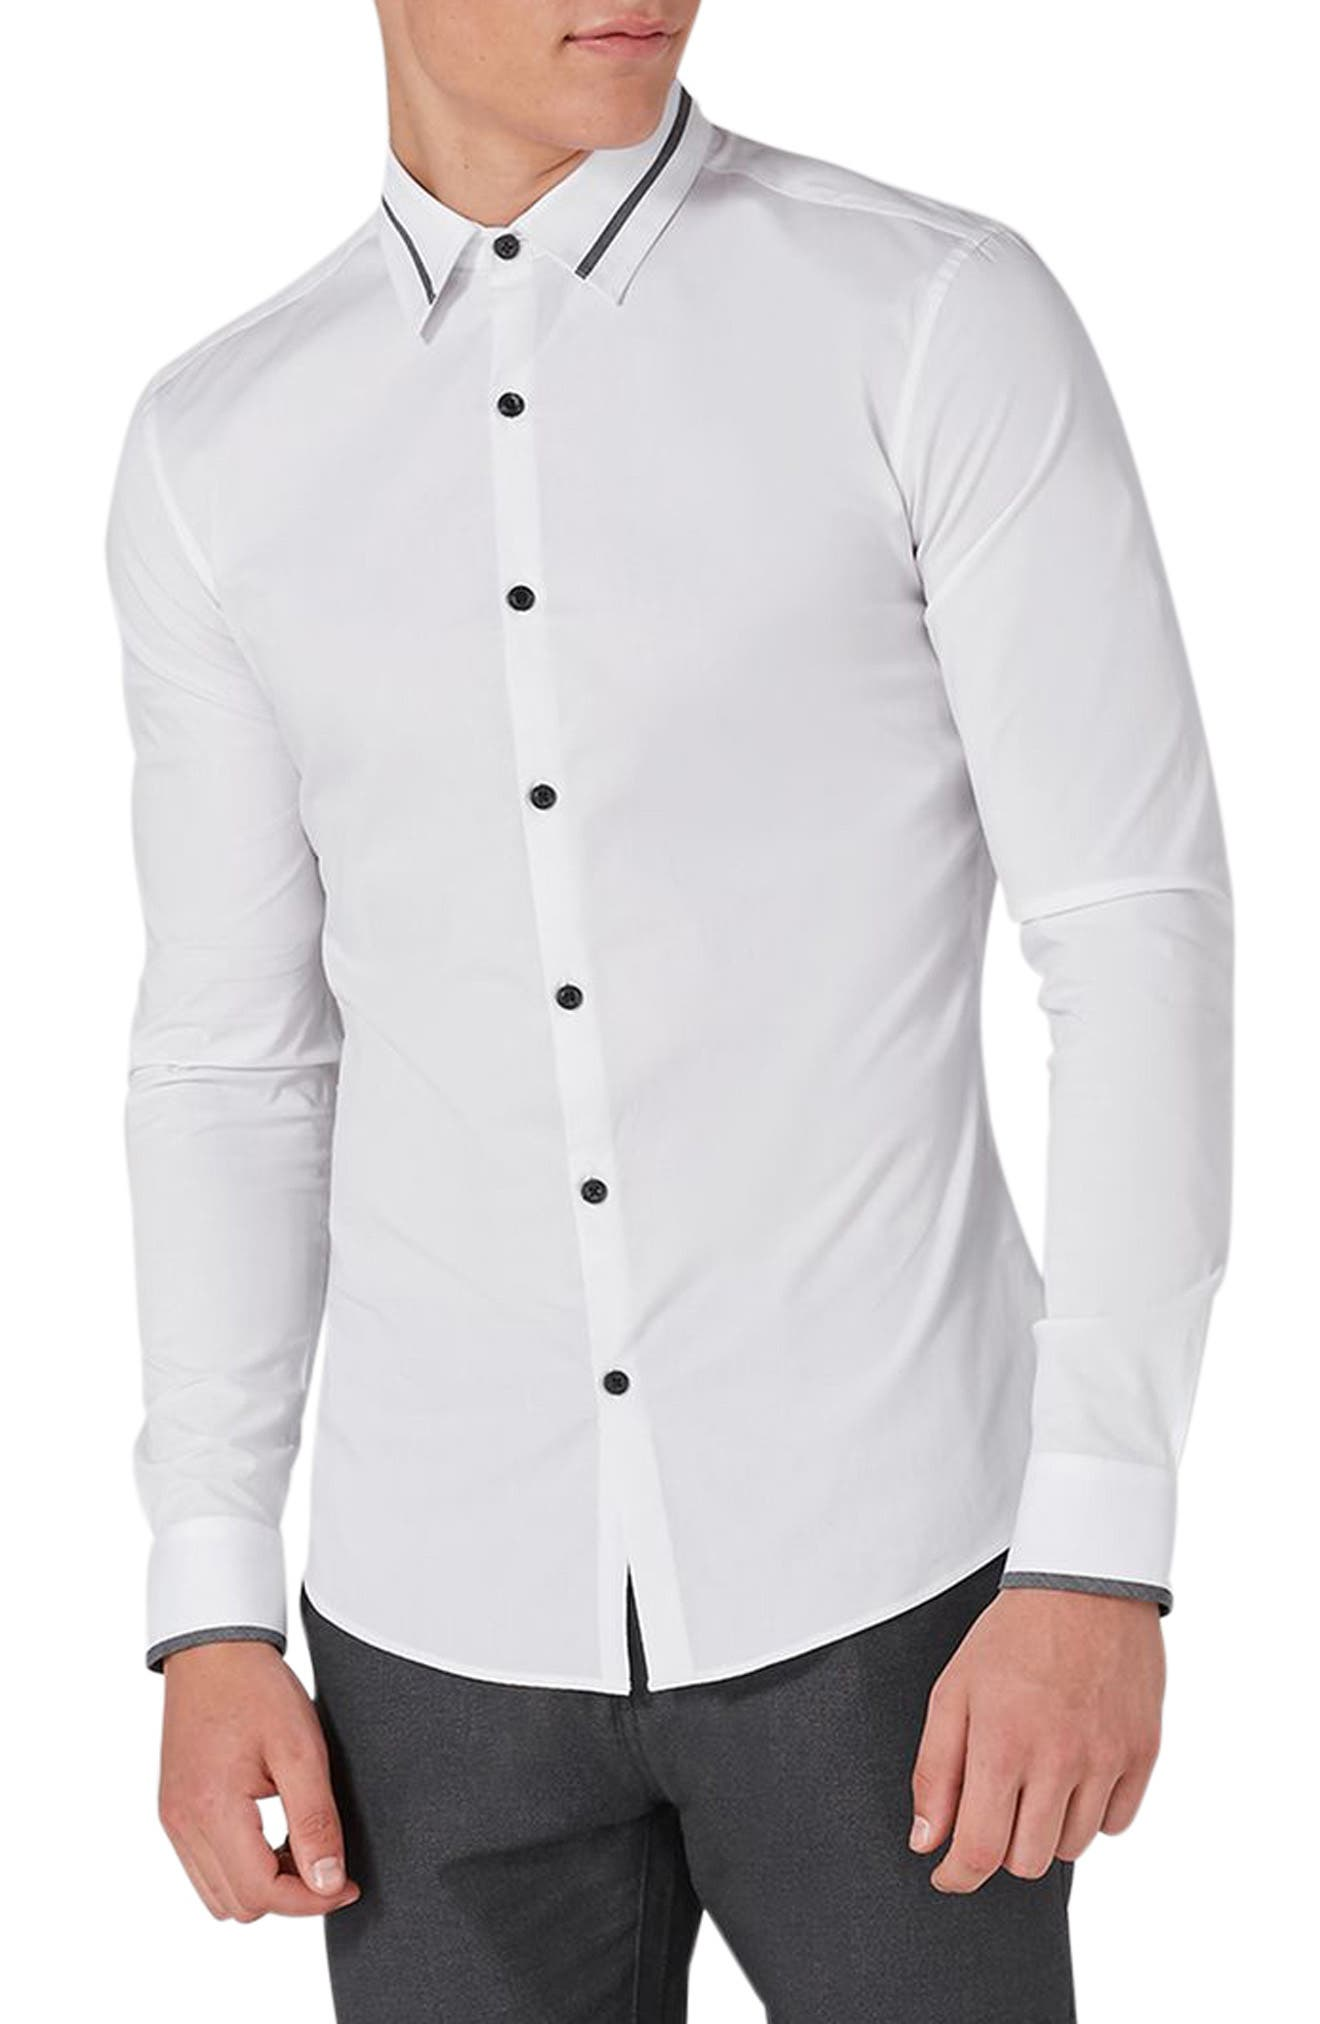 Alternate Image 1 Selected - Topman Muscle Fit Contrast Trim Smart Shirt